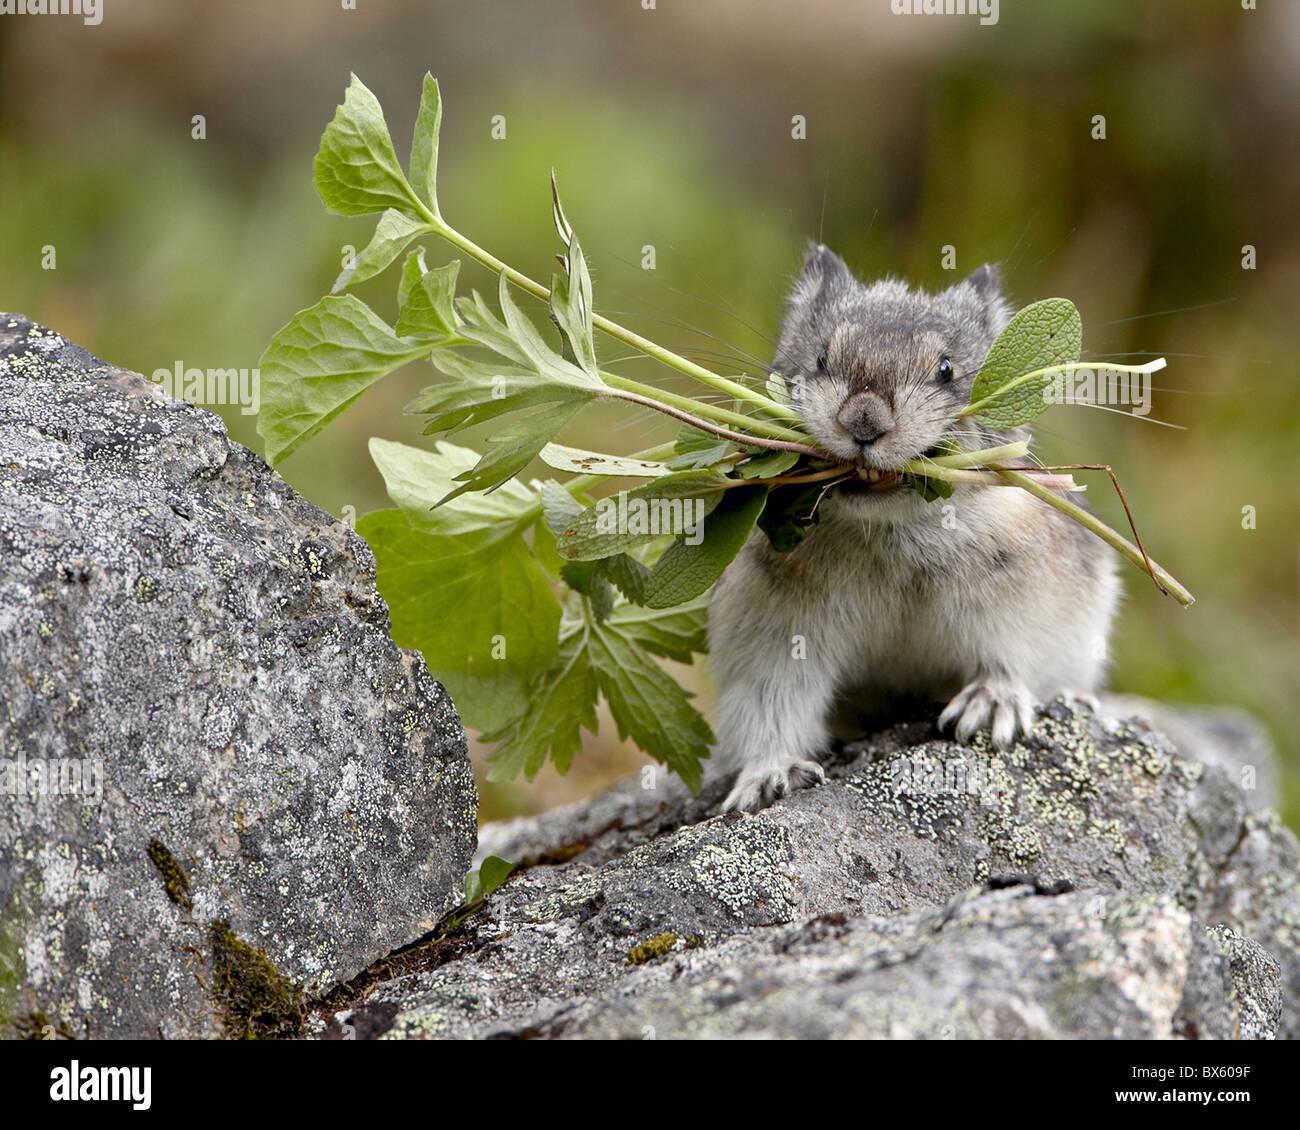 Collared Pika (Ochotona collaris) taking food to a cache, Hatcher Pass, Alaska, United States of America, North - Stock Image